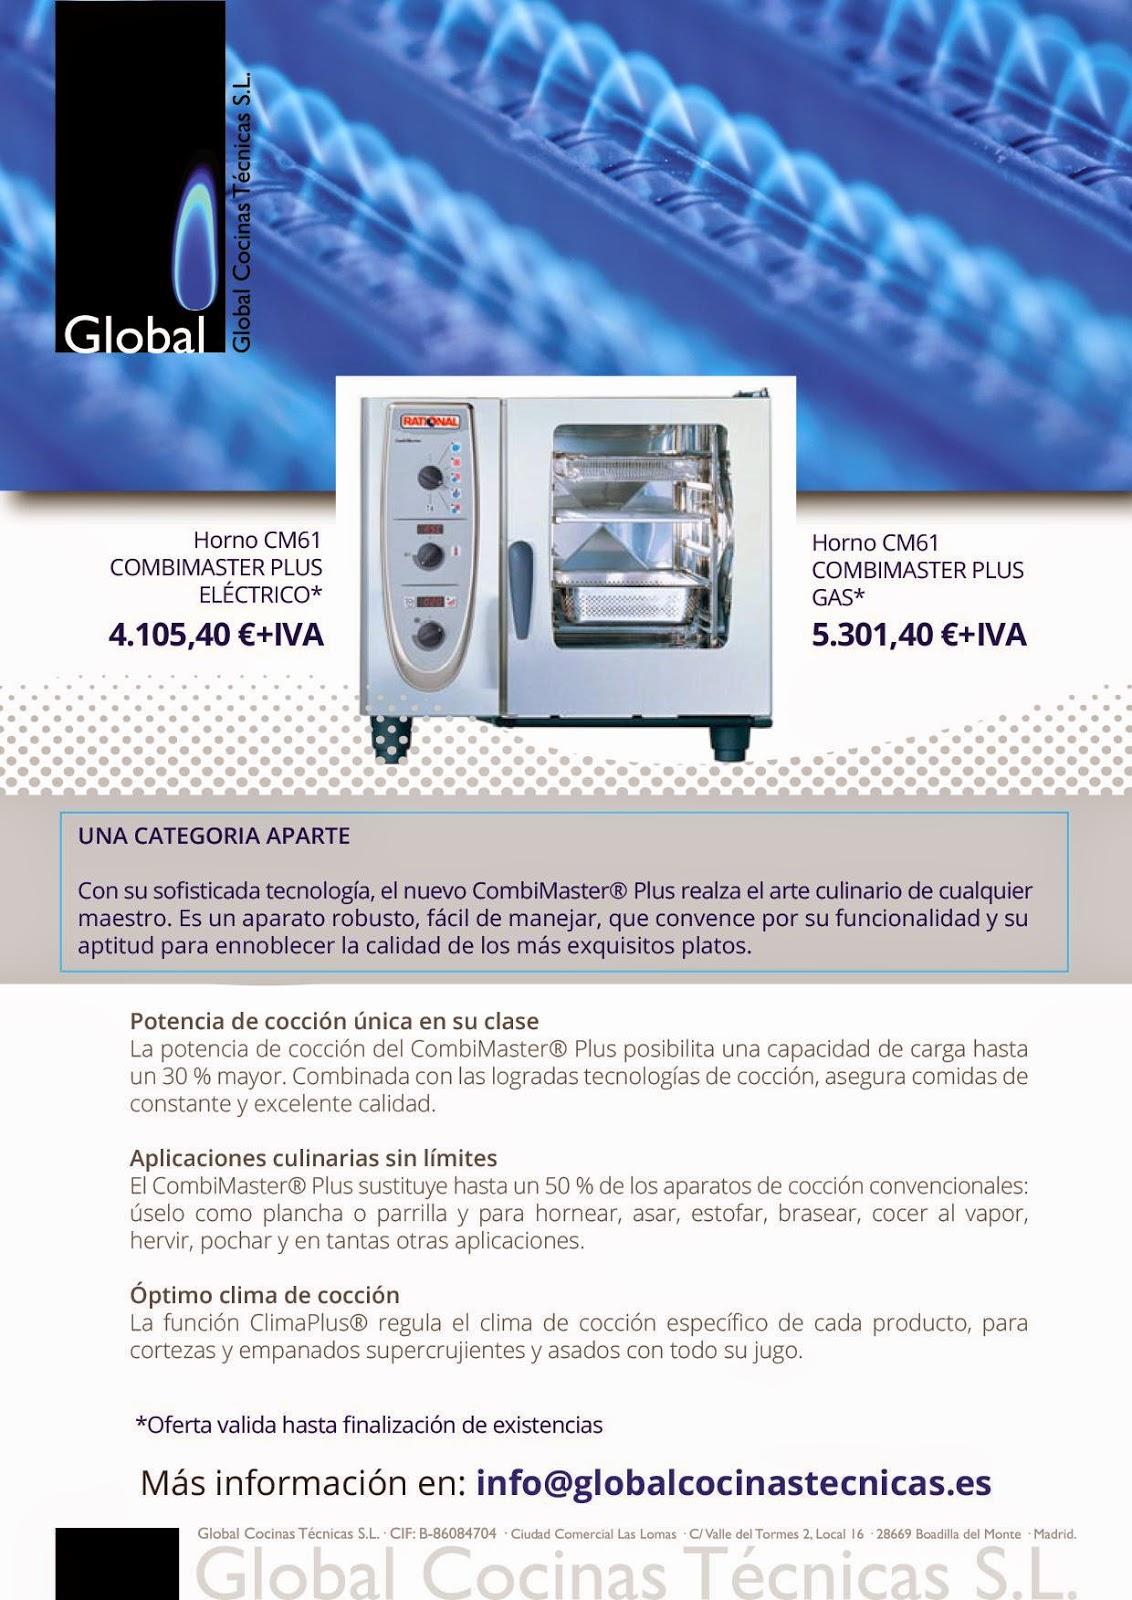 Global Cocinas Técnicas: 2015